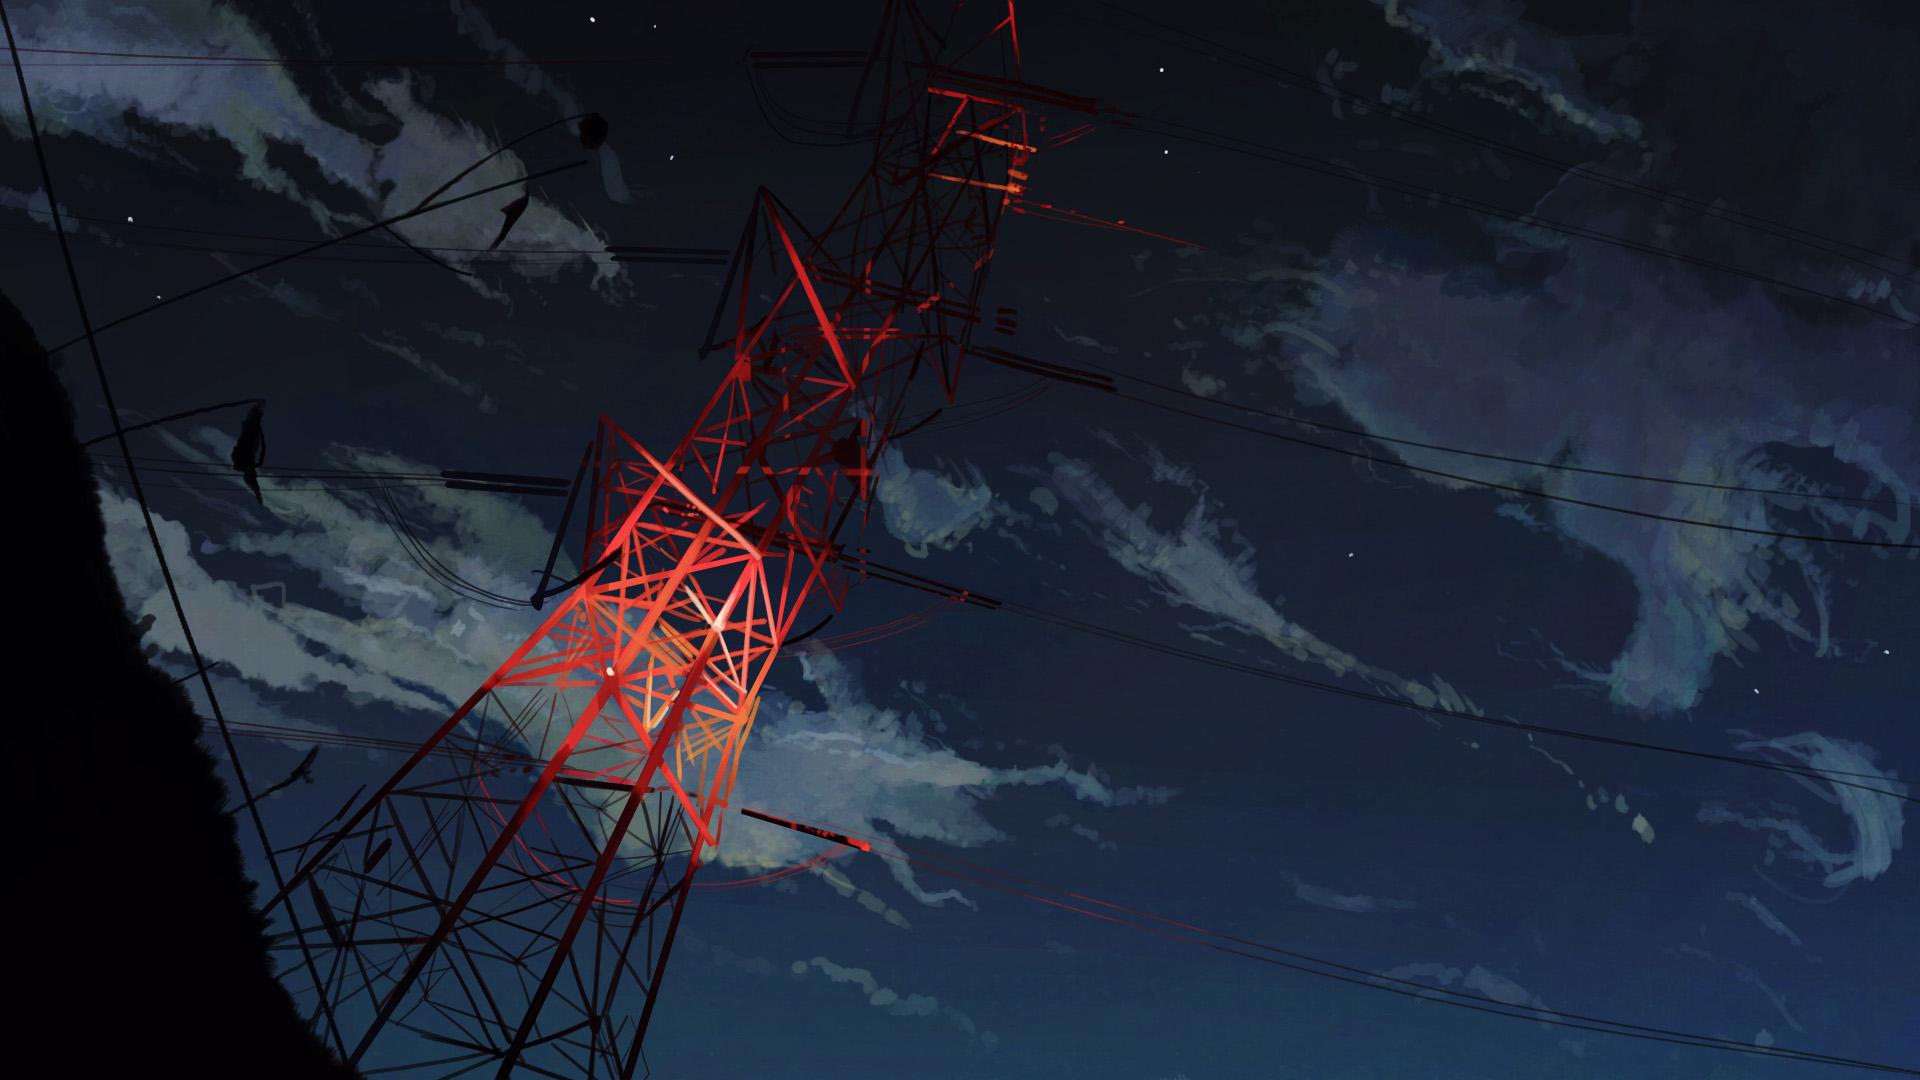 Anime 1920x1080 anime power lines sky clouds outdoors